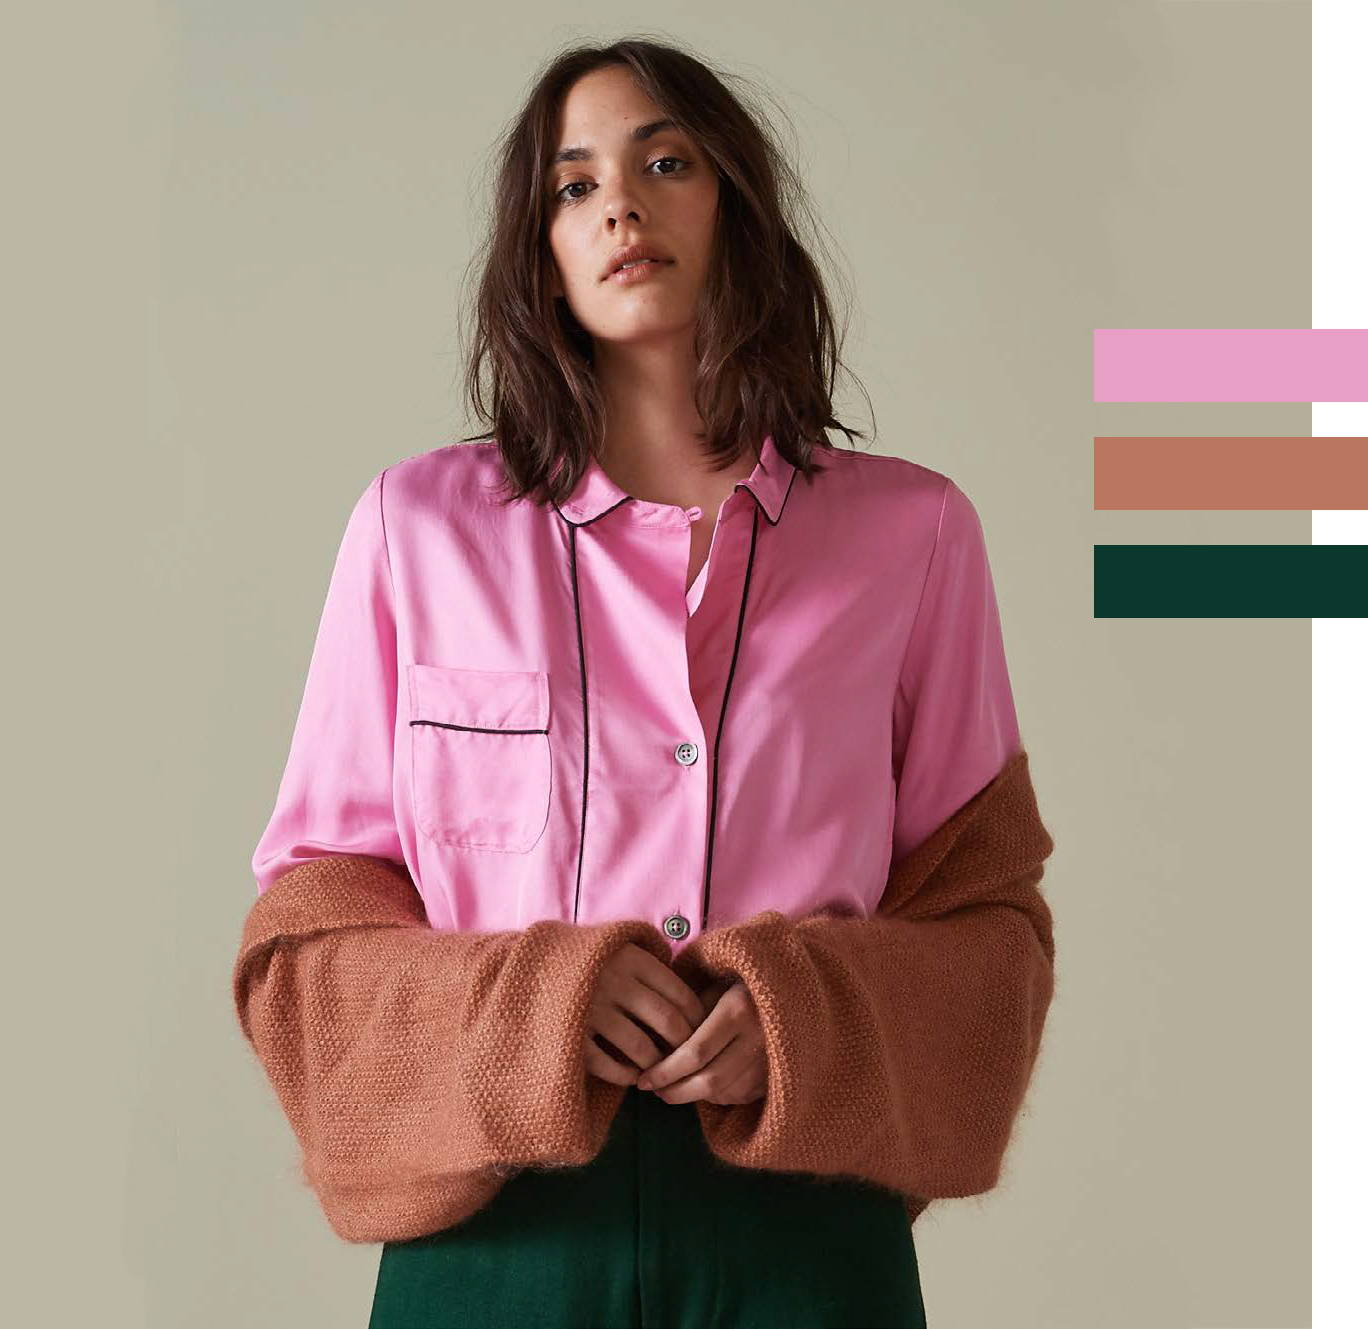 Bellerose Holdup Shirt in Brianna Cyclamen